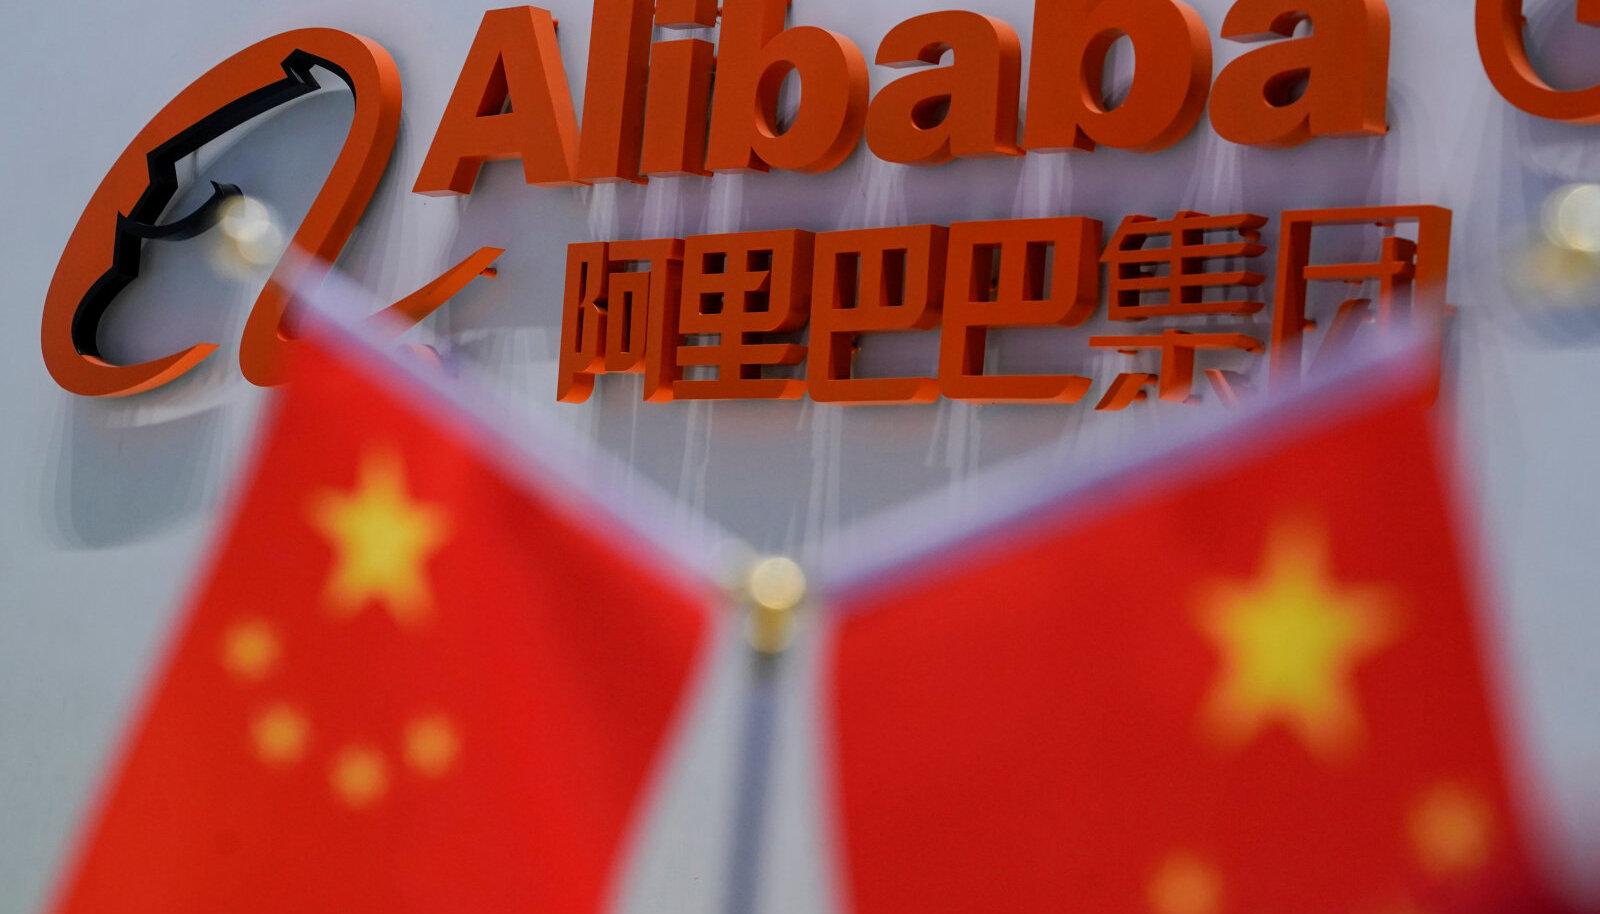 Alibaba grupi logo